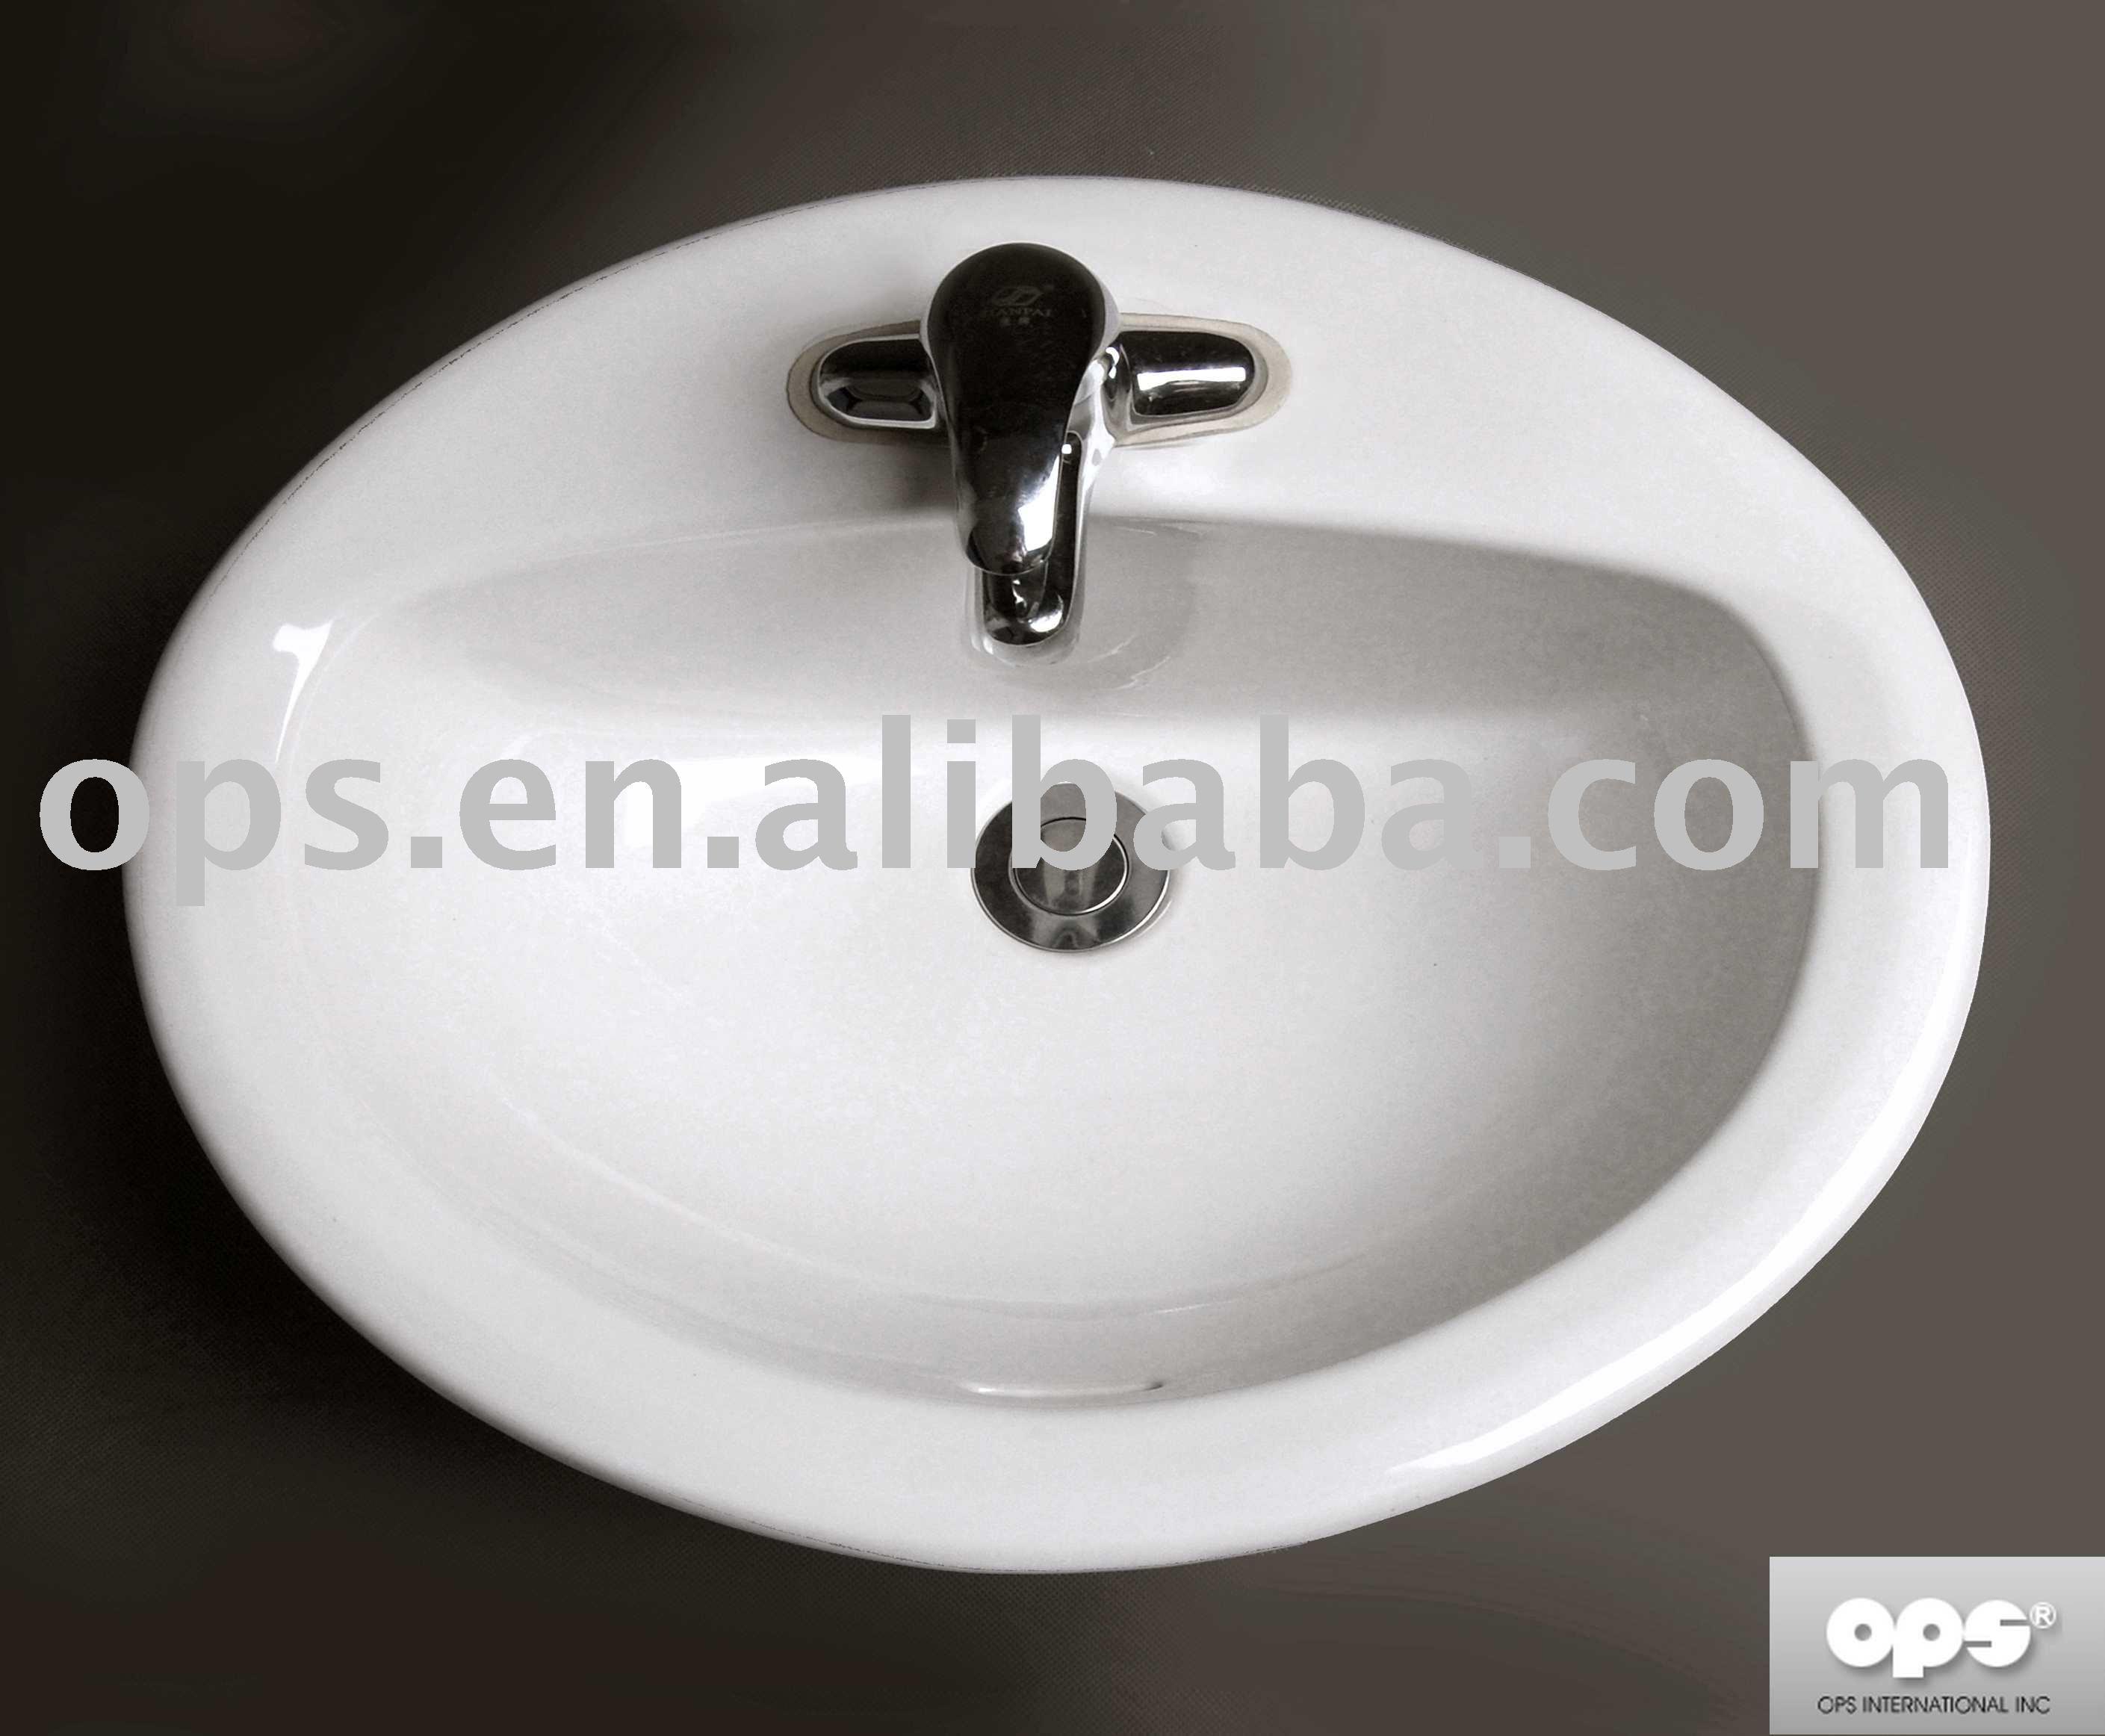 Imperial Ware Australia - Bathroom Products, Bathroom Ware, Toilet